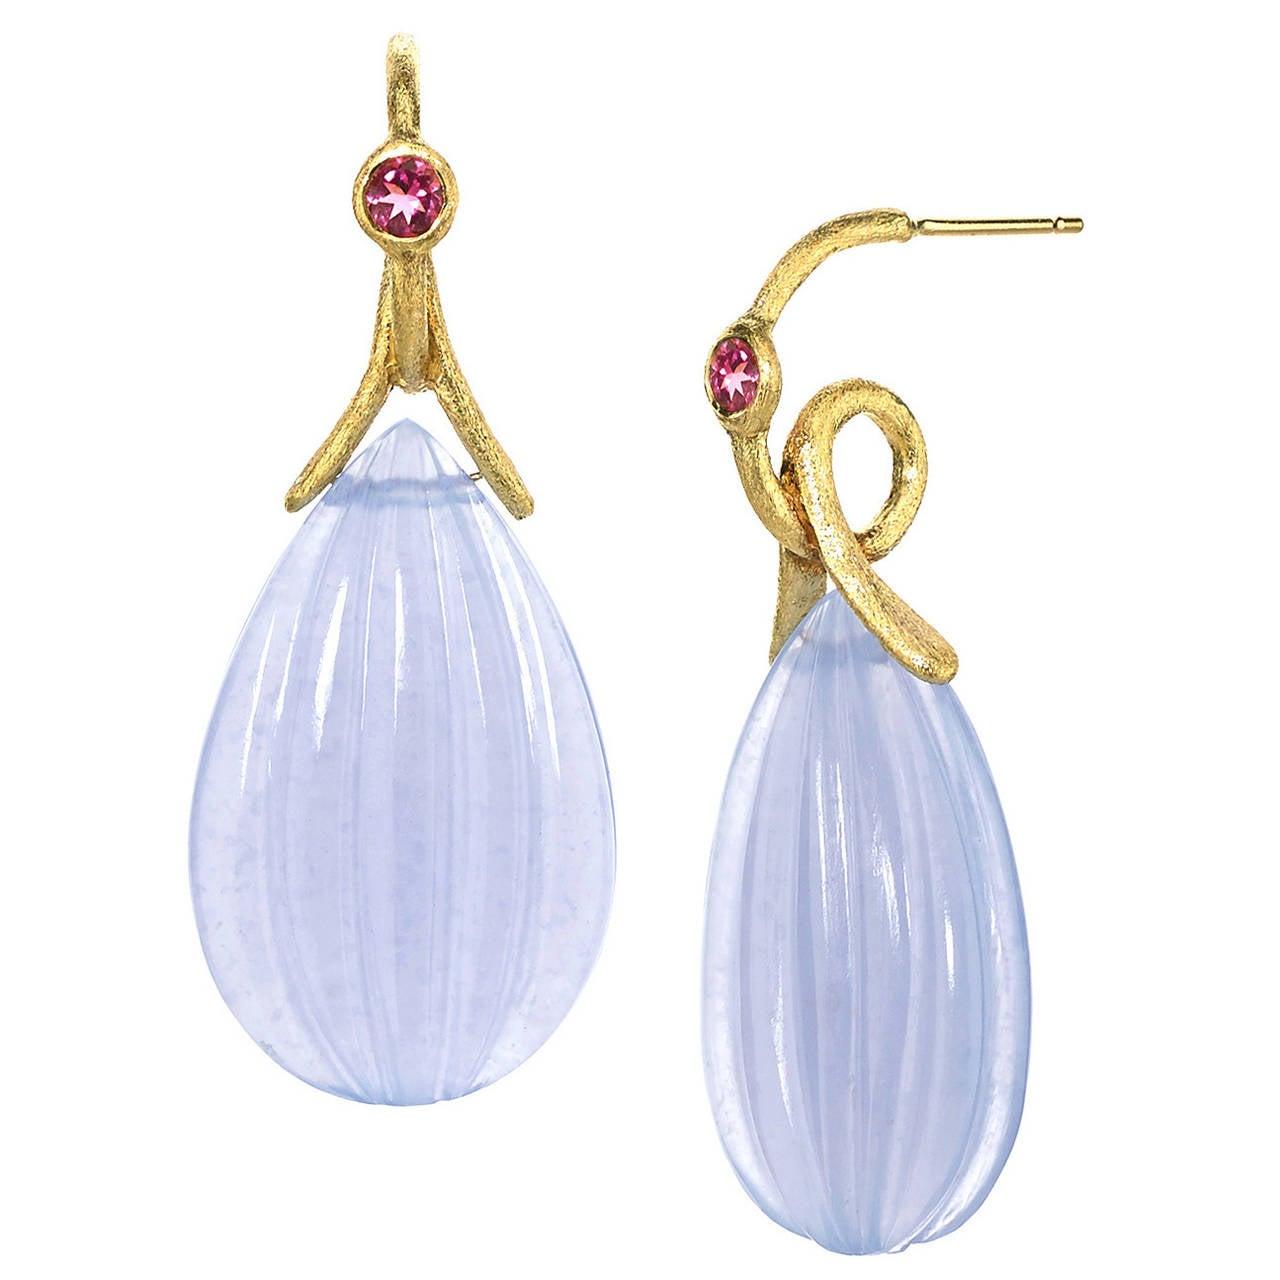 Joseph Murray Pink Tourmaline Dangling Chalcedony Satin Gold Loop Drop Earrings For Sale